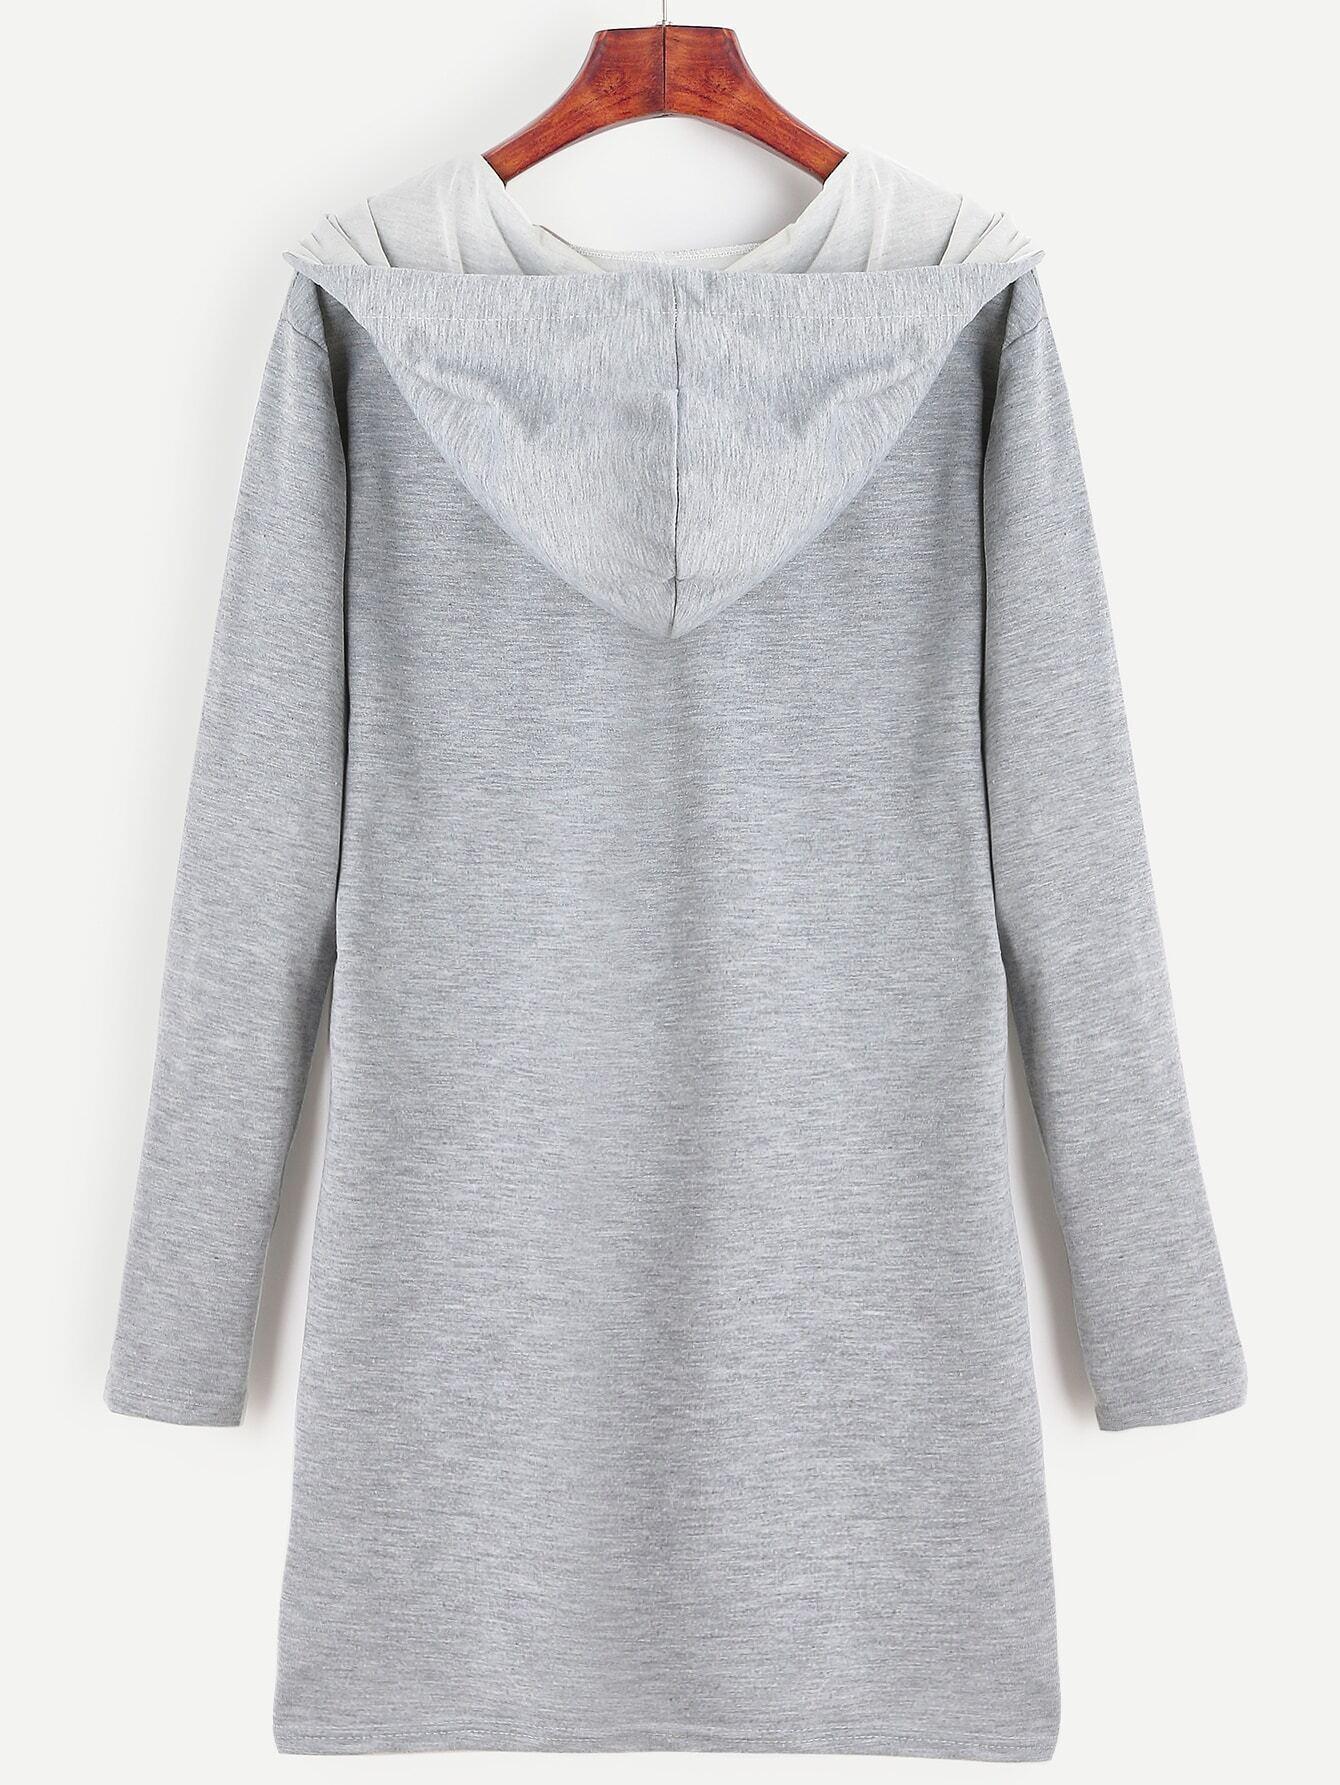 robe sweat shirt manche longue avec capuche gris french romwe. Black Bedroom Furniture Sets. Home Design Ideas